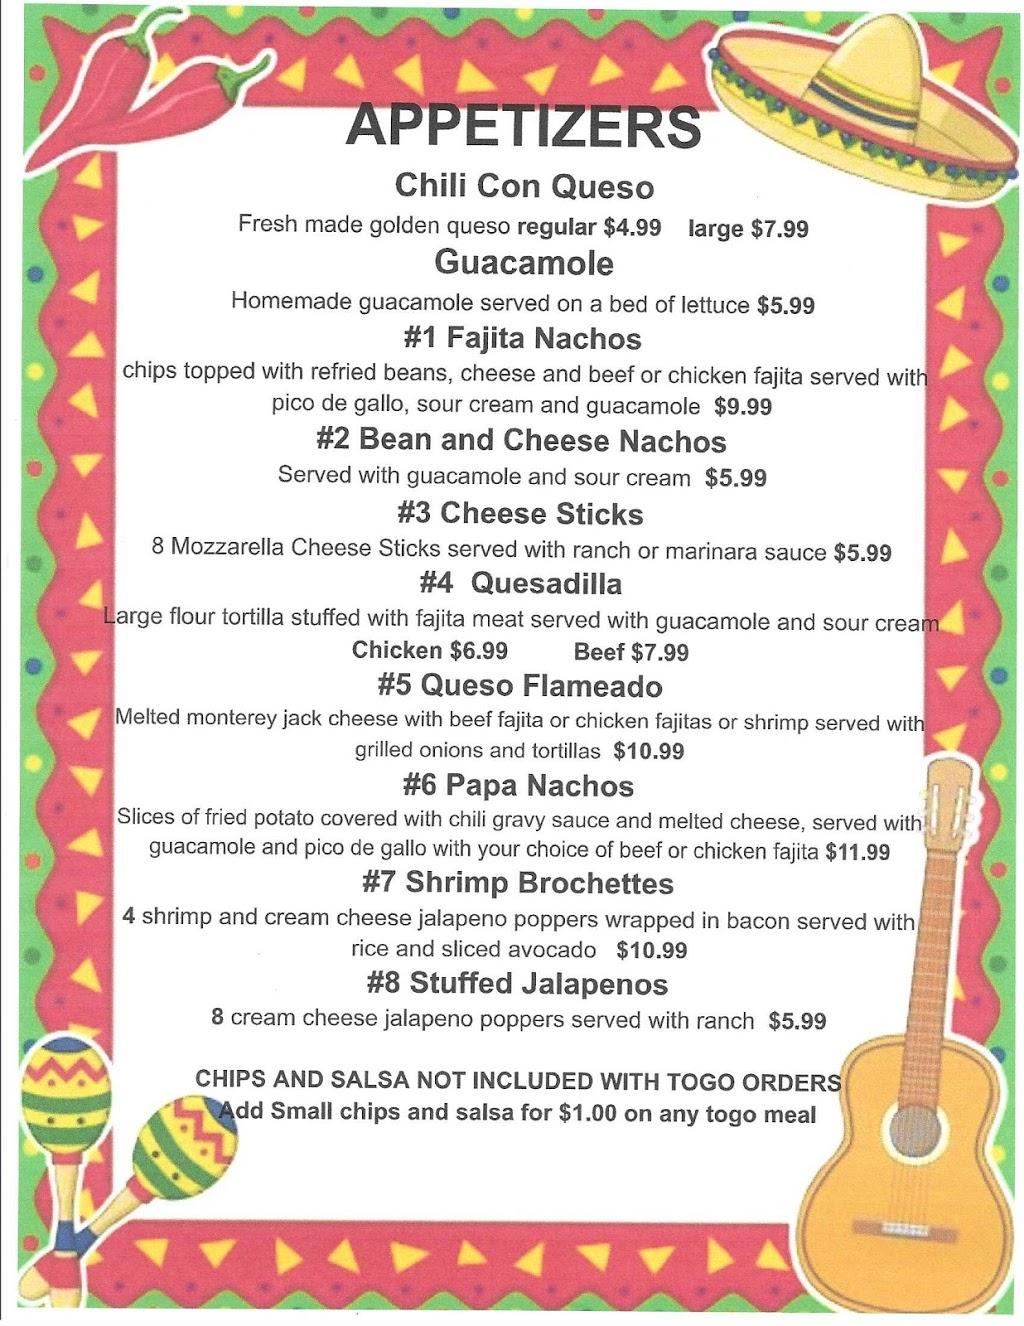 Habaneros mexican restaurant | restaurant | 556 W 1st St, Groveton, TX 75845, USA | 9366423053 OR +1 936-642-3053